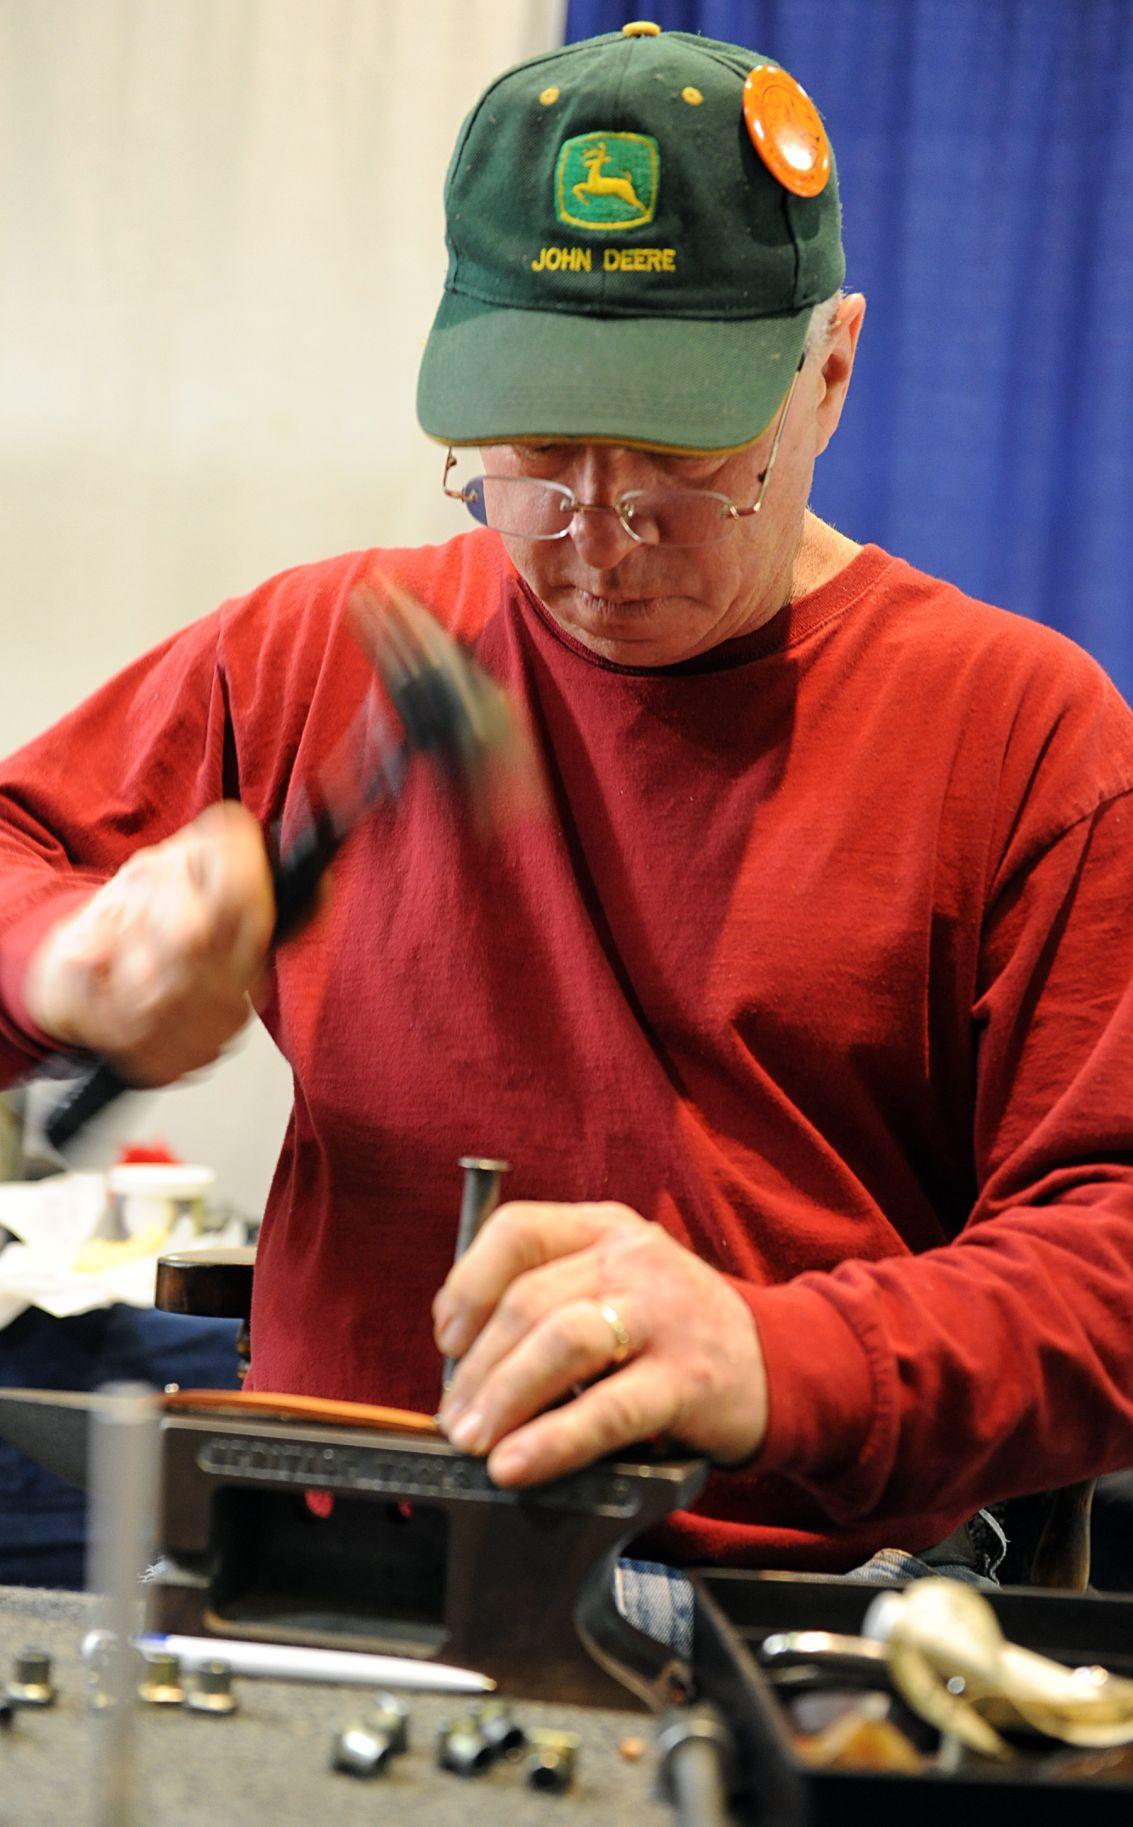 Capital city art craft show celebrates 50 years events for Capital city arts and crafts show charleston wv